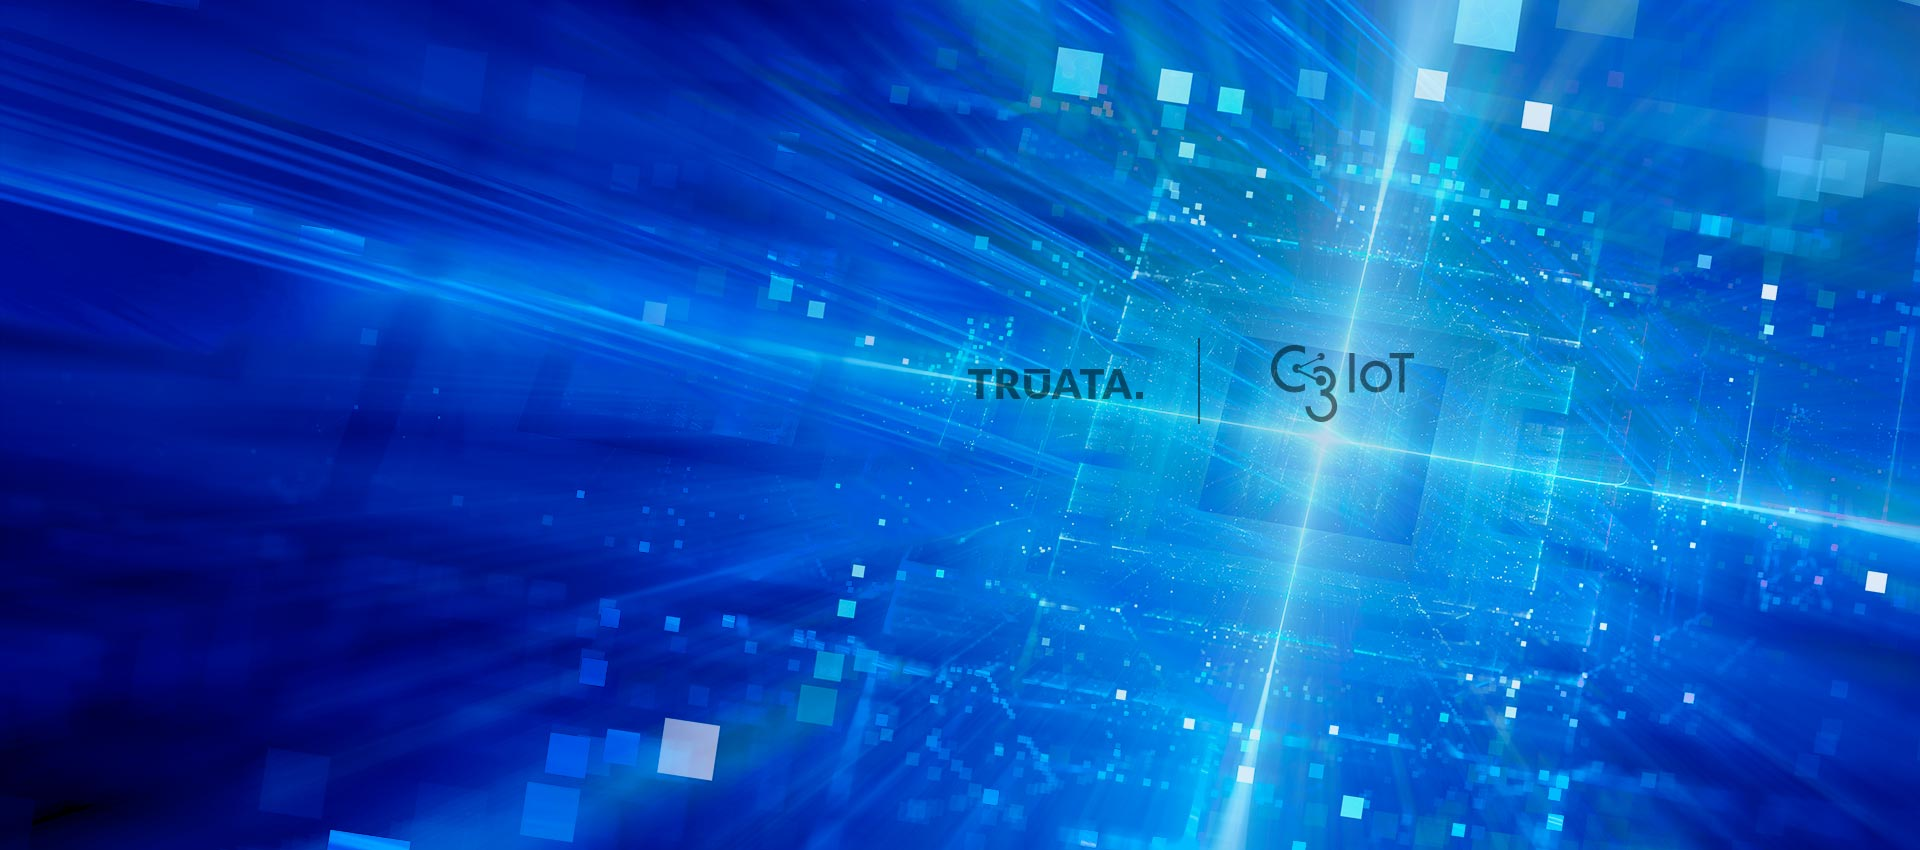 Truata selects C3 IoT